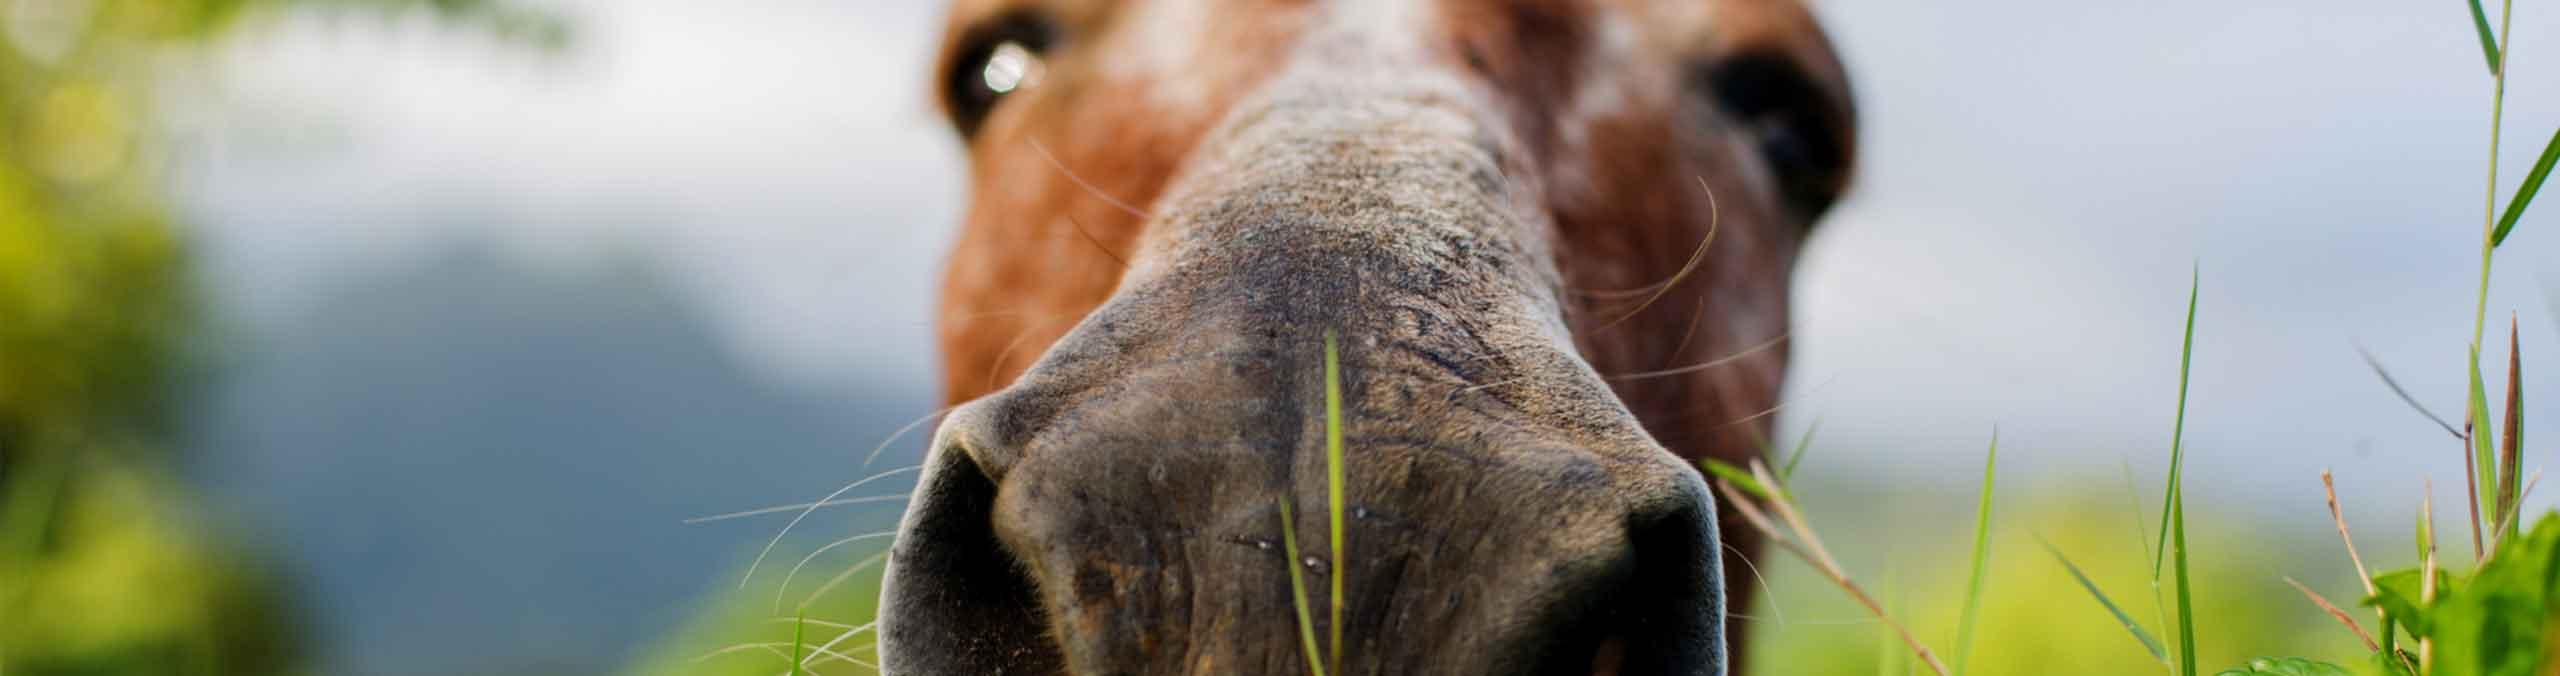 Horse pressing nose on camera